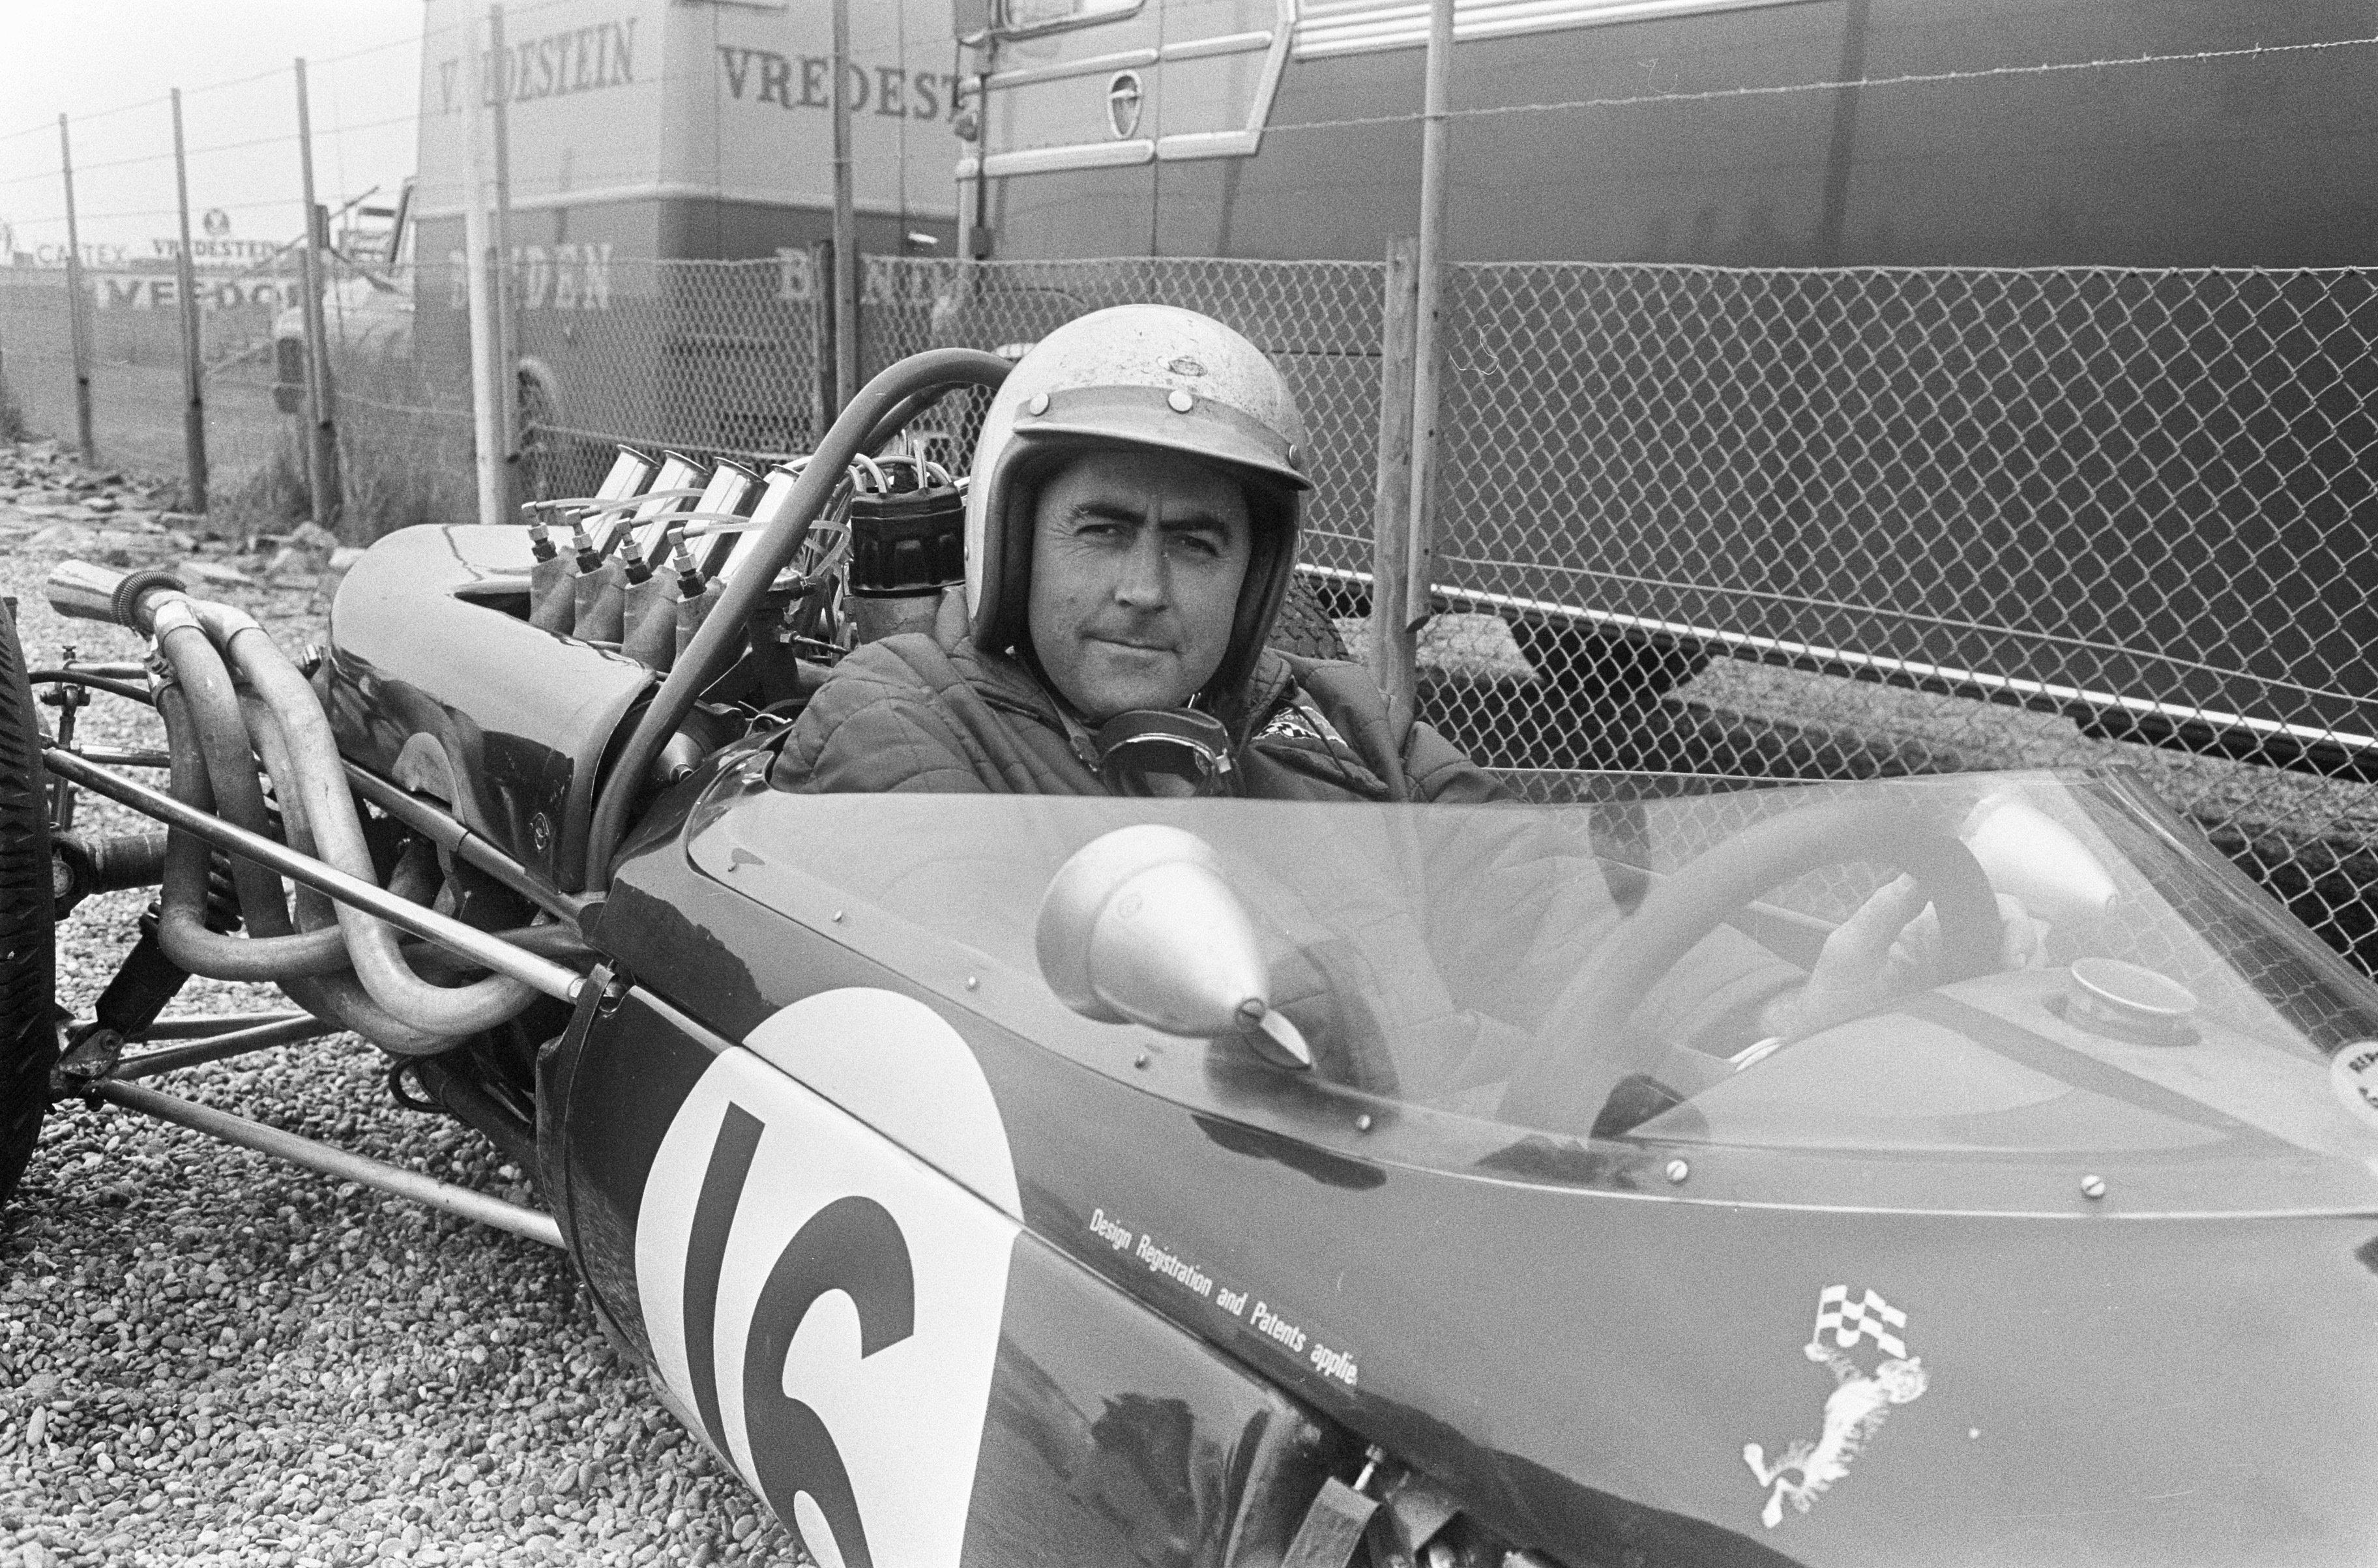 http://upload.wikimedia.org/wikipedia/commons/5/5c/Brabham_at_1966_Dutch_Grand_Prix.jpg